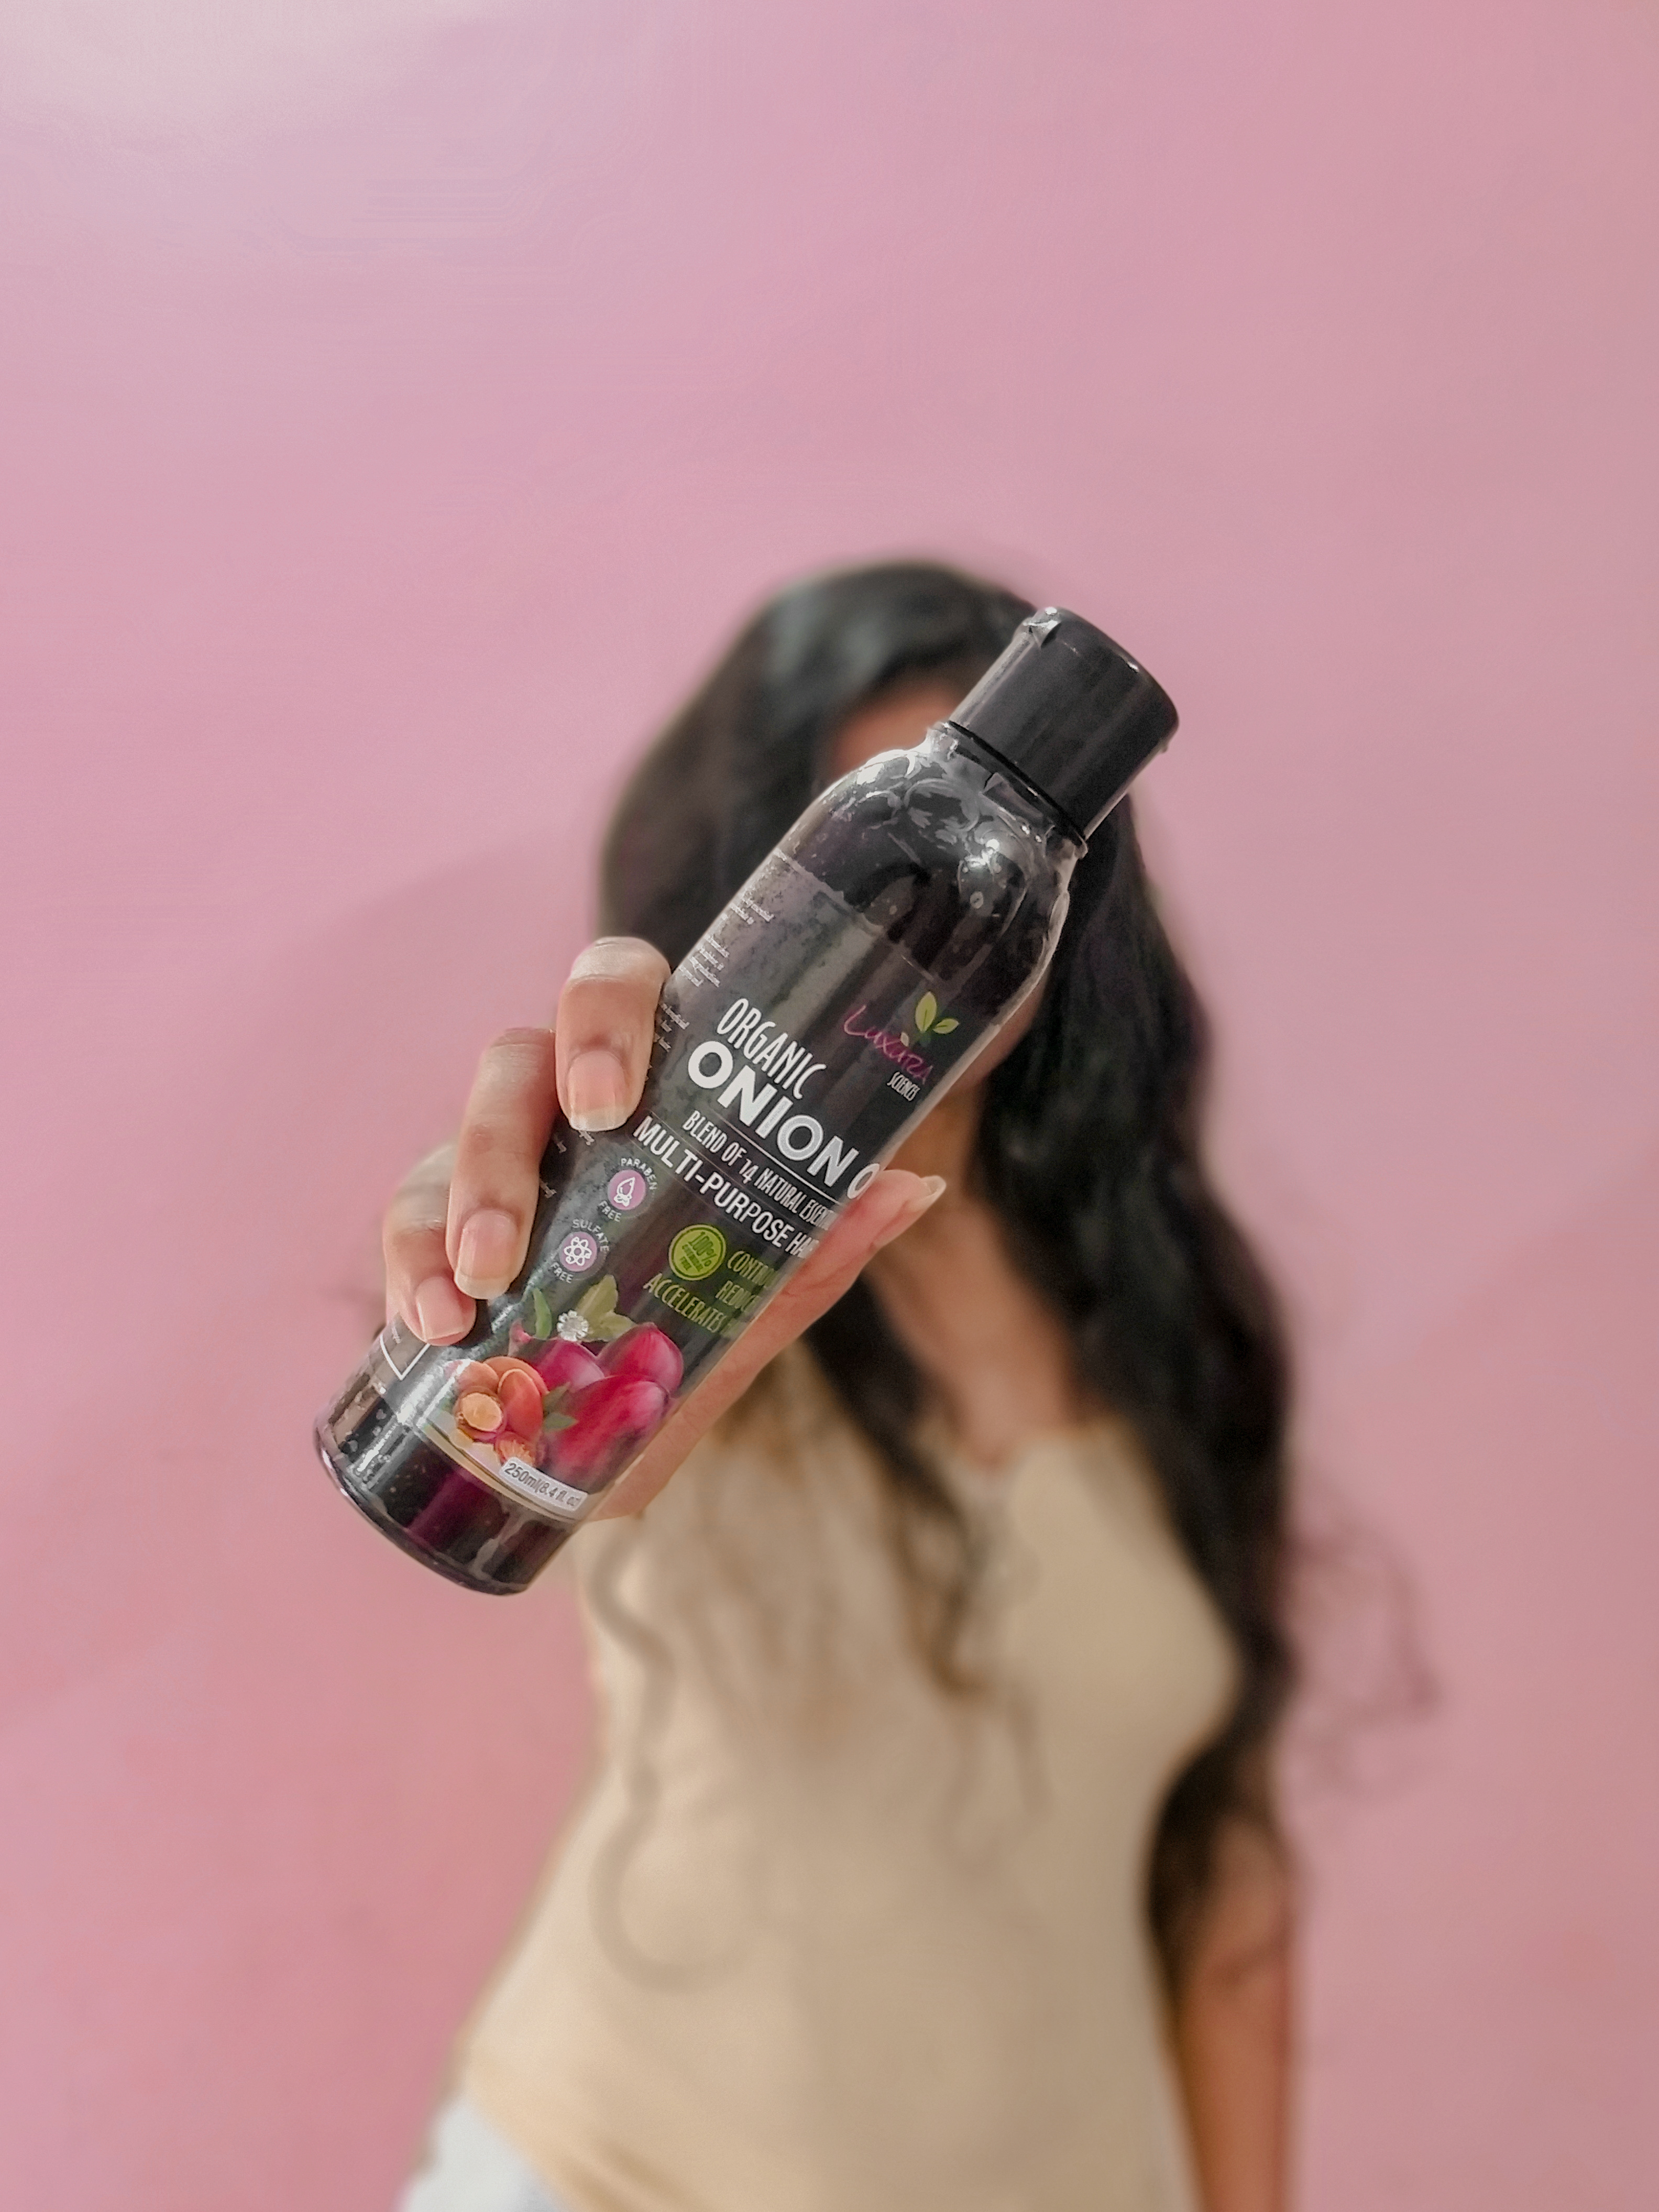 Luxura Sciences Onion Hair Oil 250 ml-Goodness of Onion-By soumita_samanta_-2